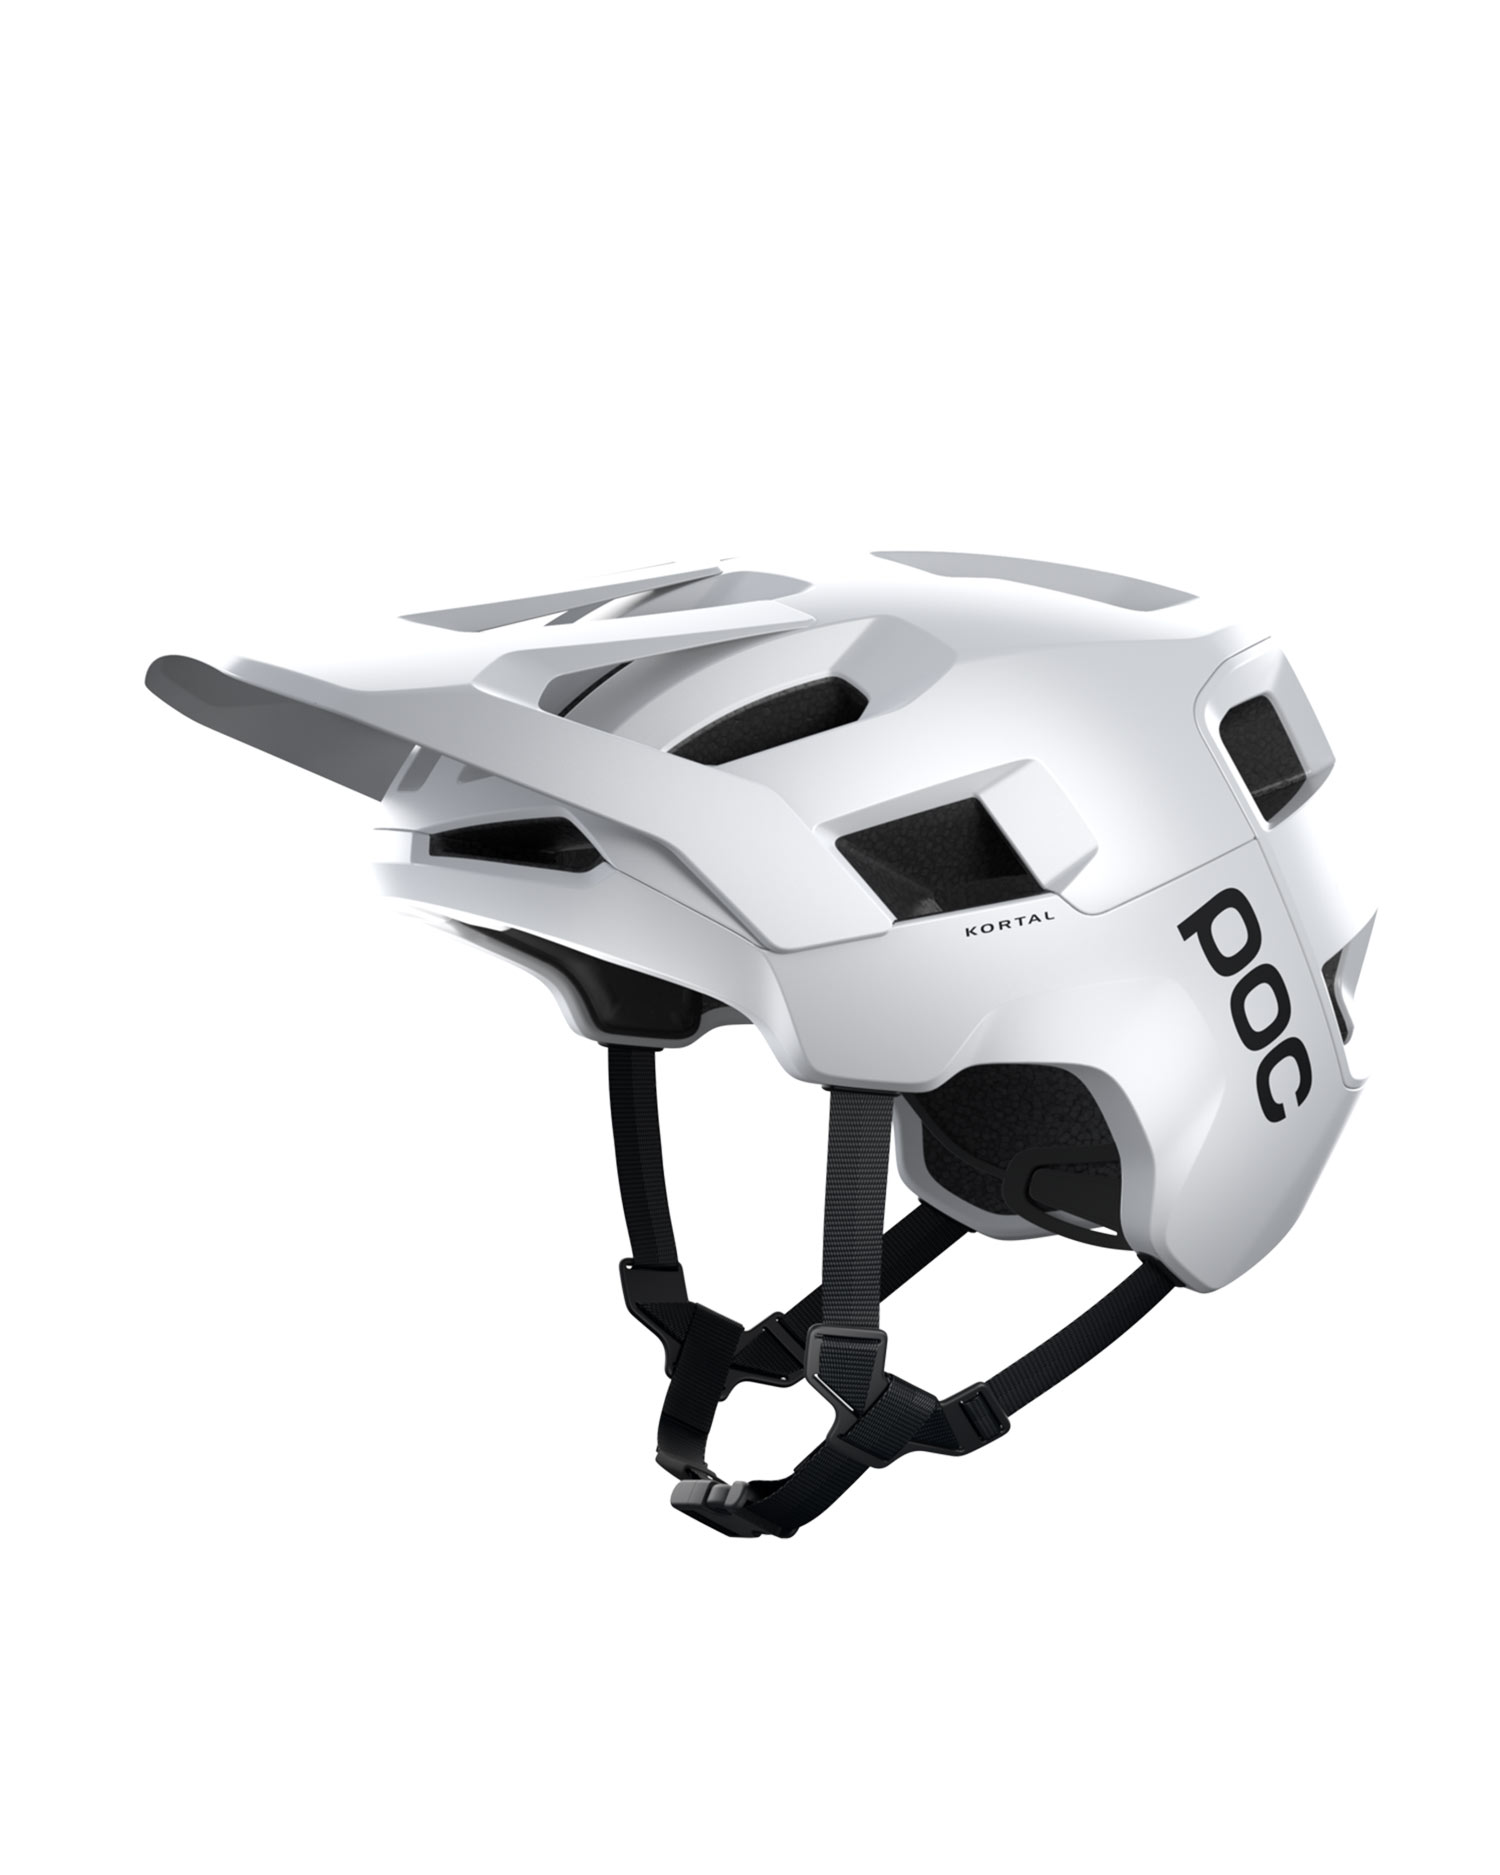 Cyklistická helma POC KORTAL